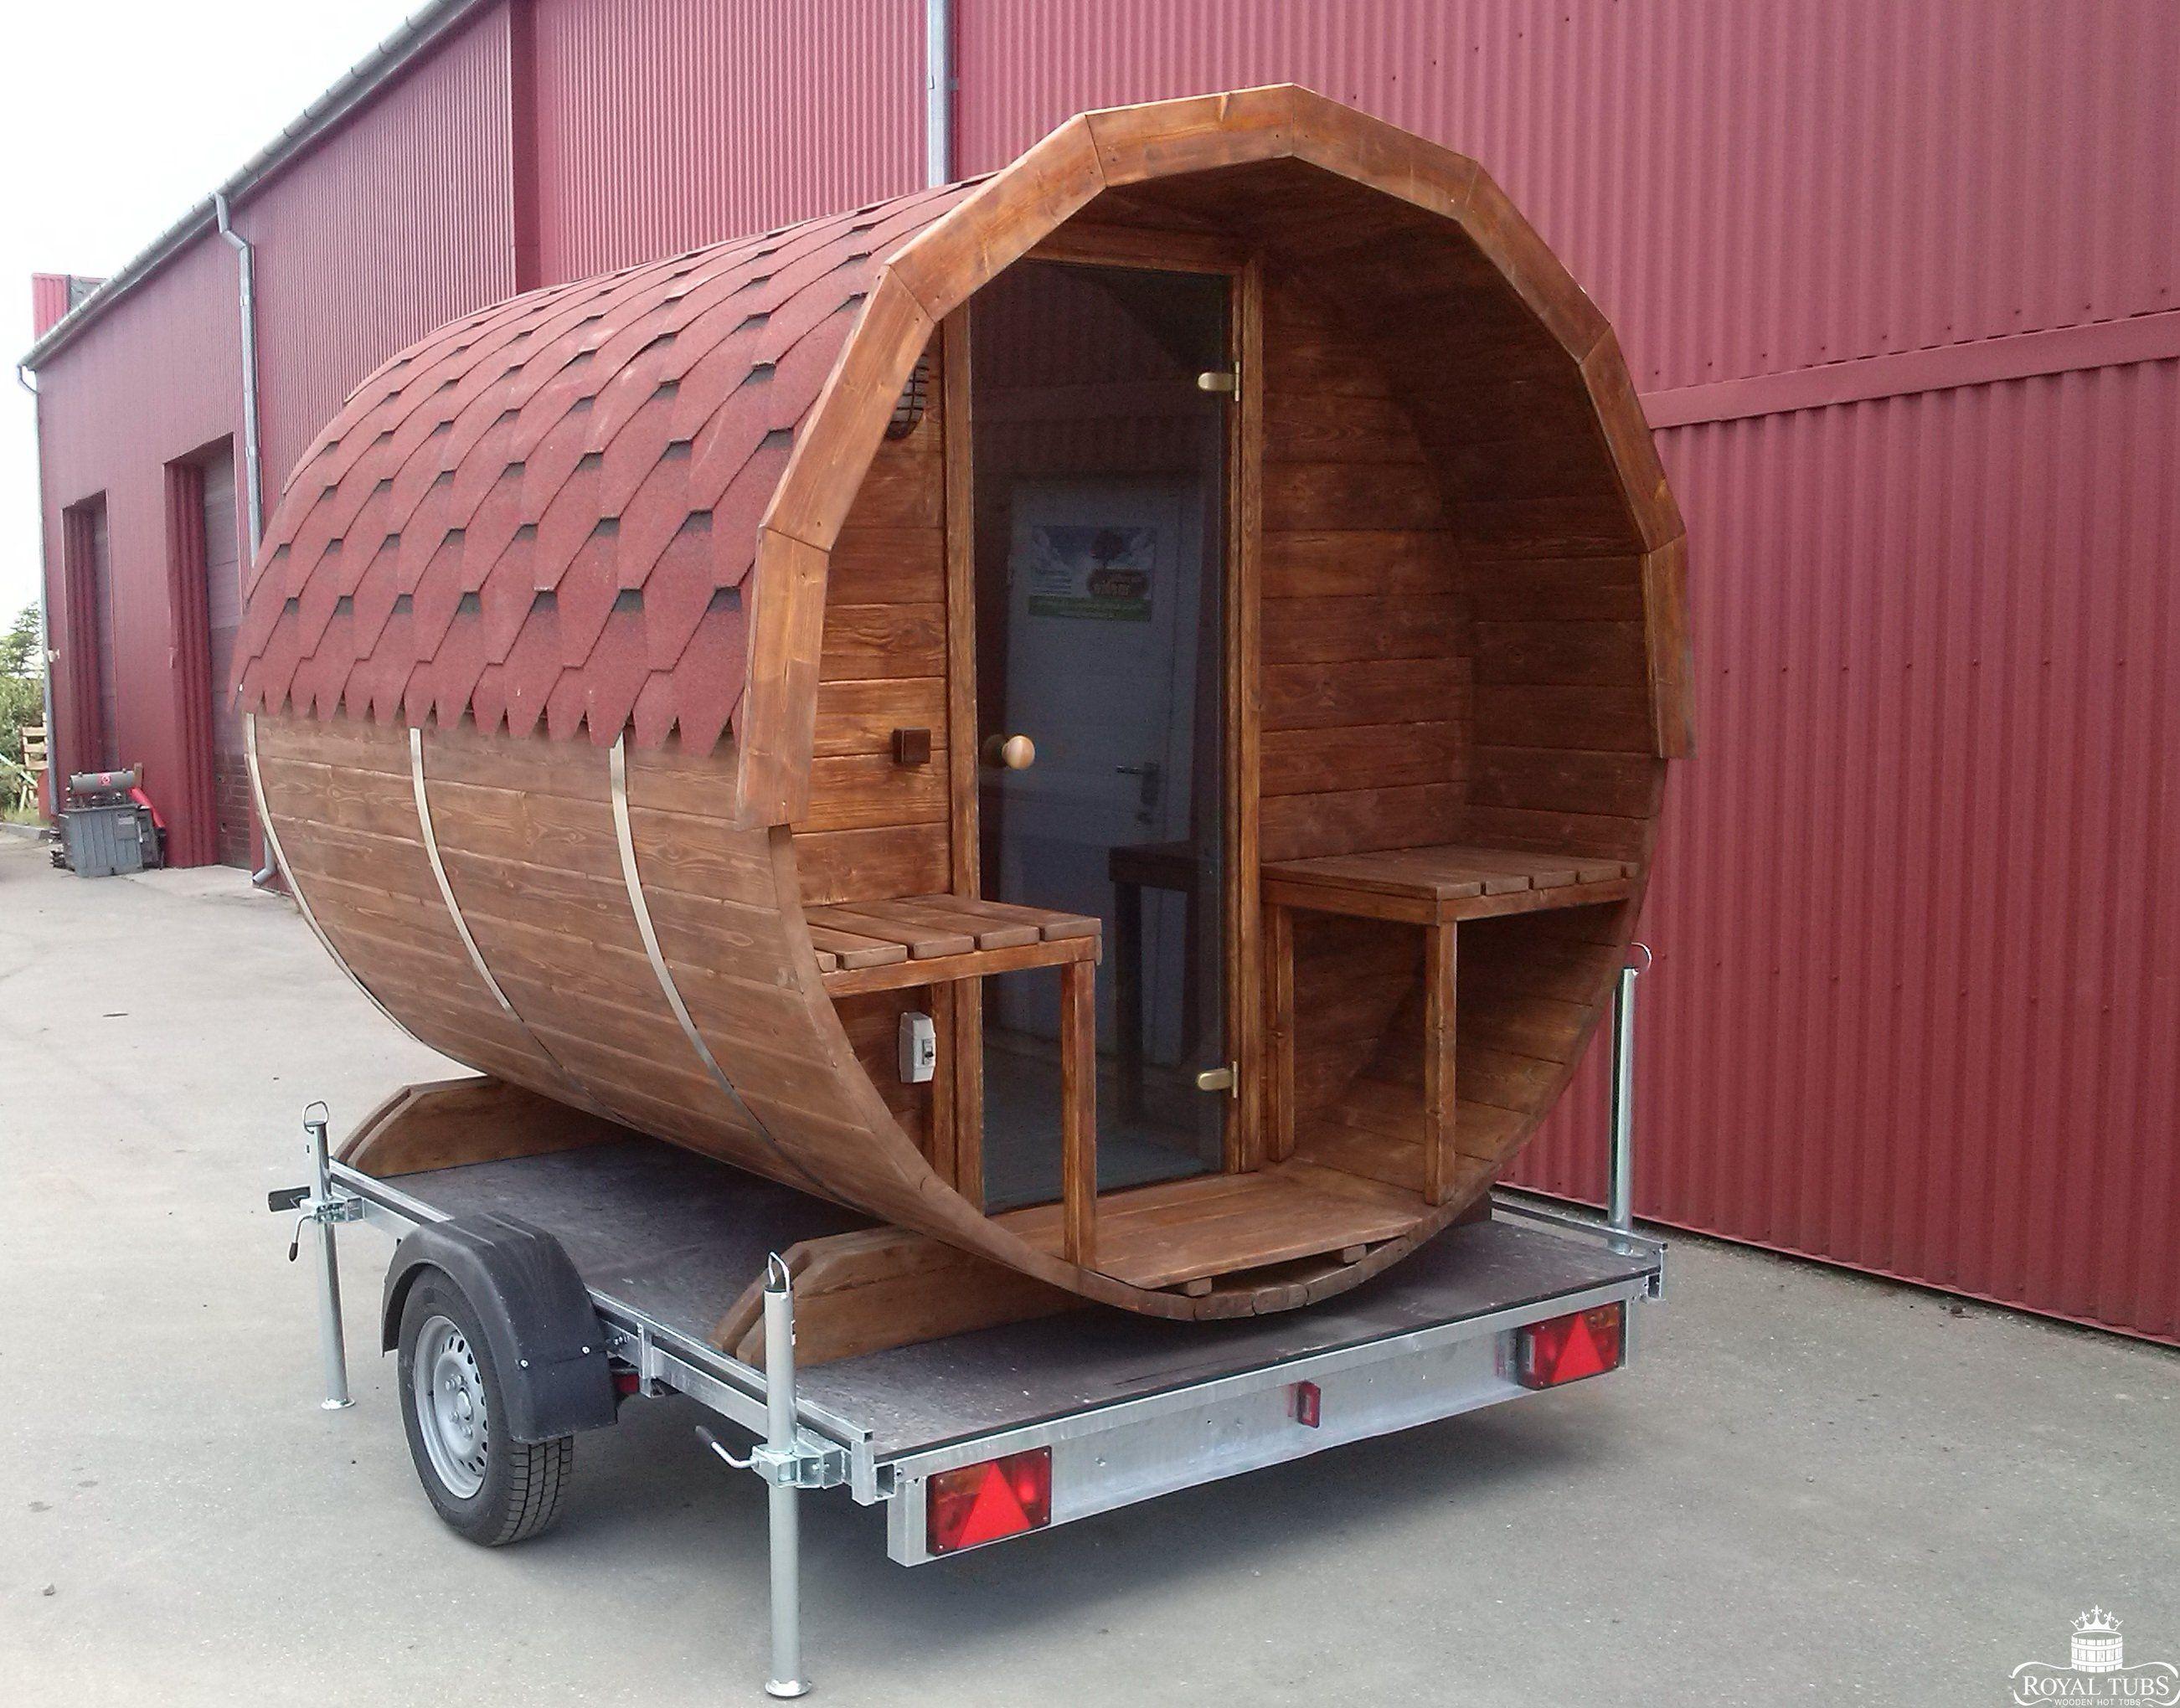 sauna hire mobile sauna sauna on wheels royaltubs co uk gibuk